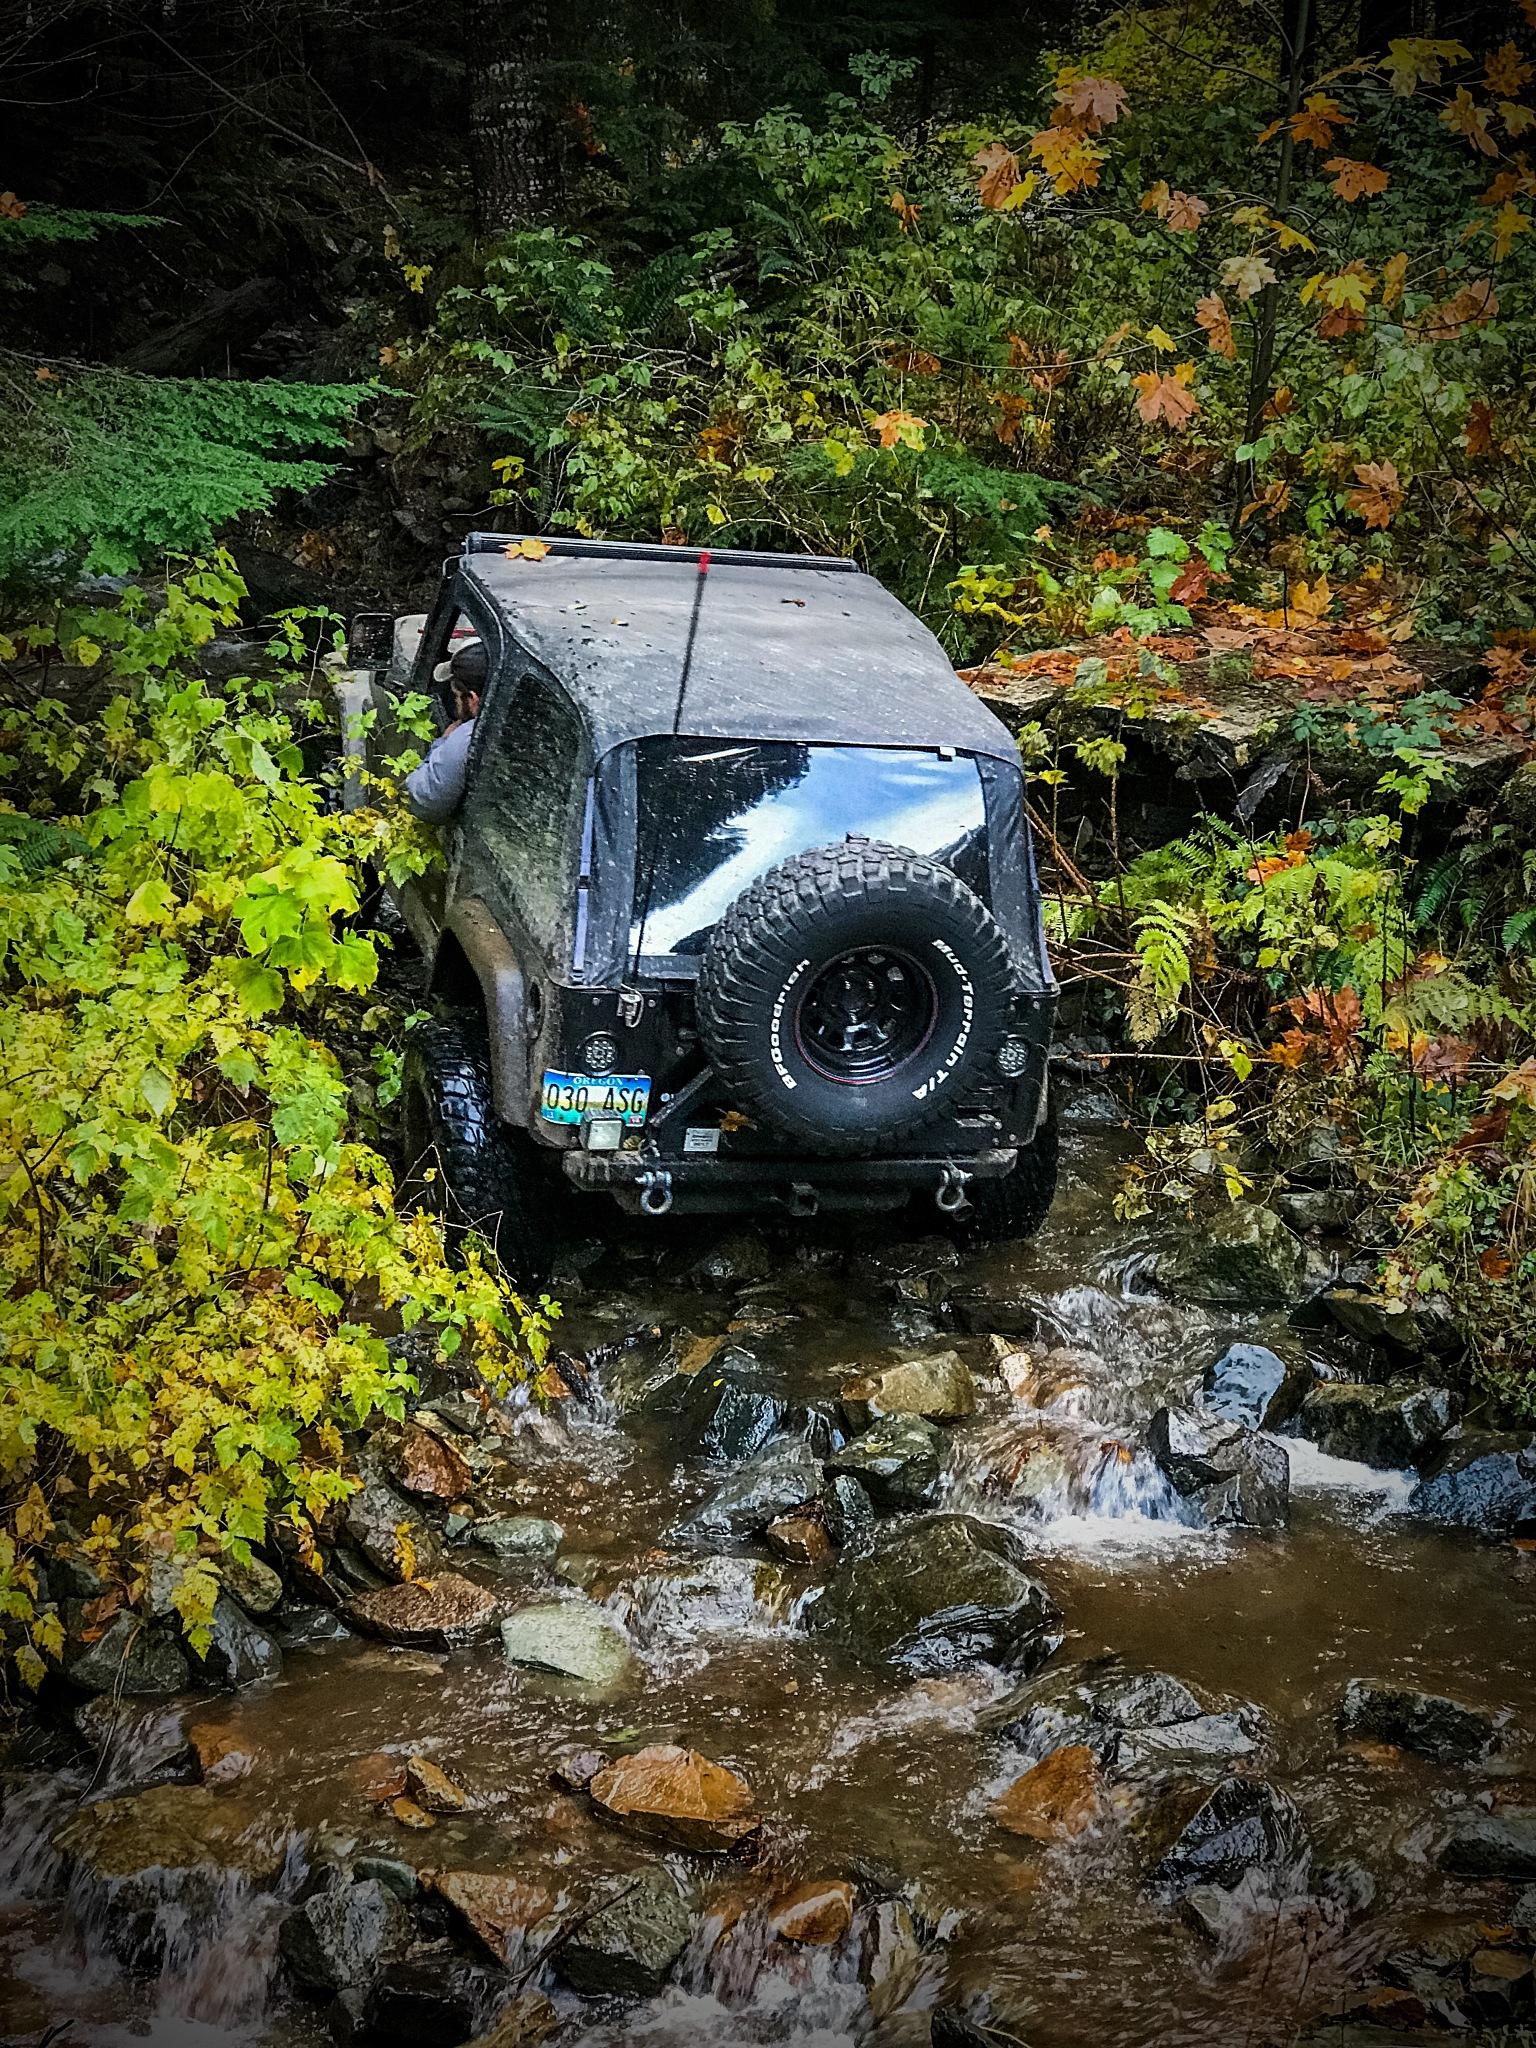 Through the Creek  by peyton0104